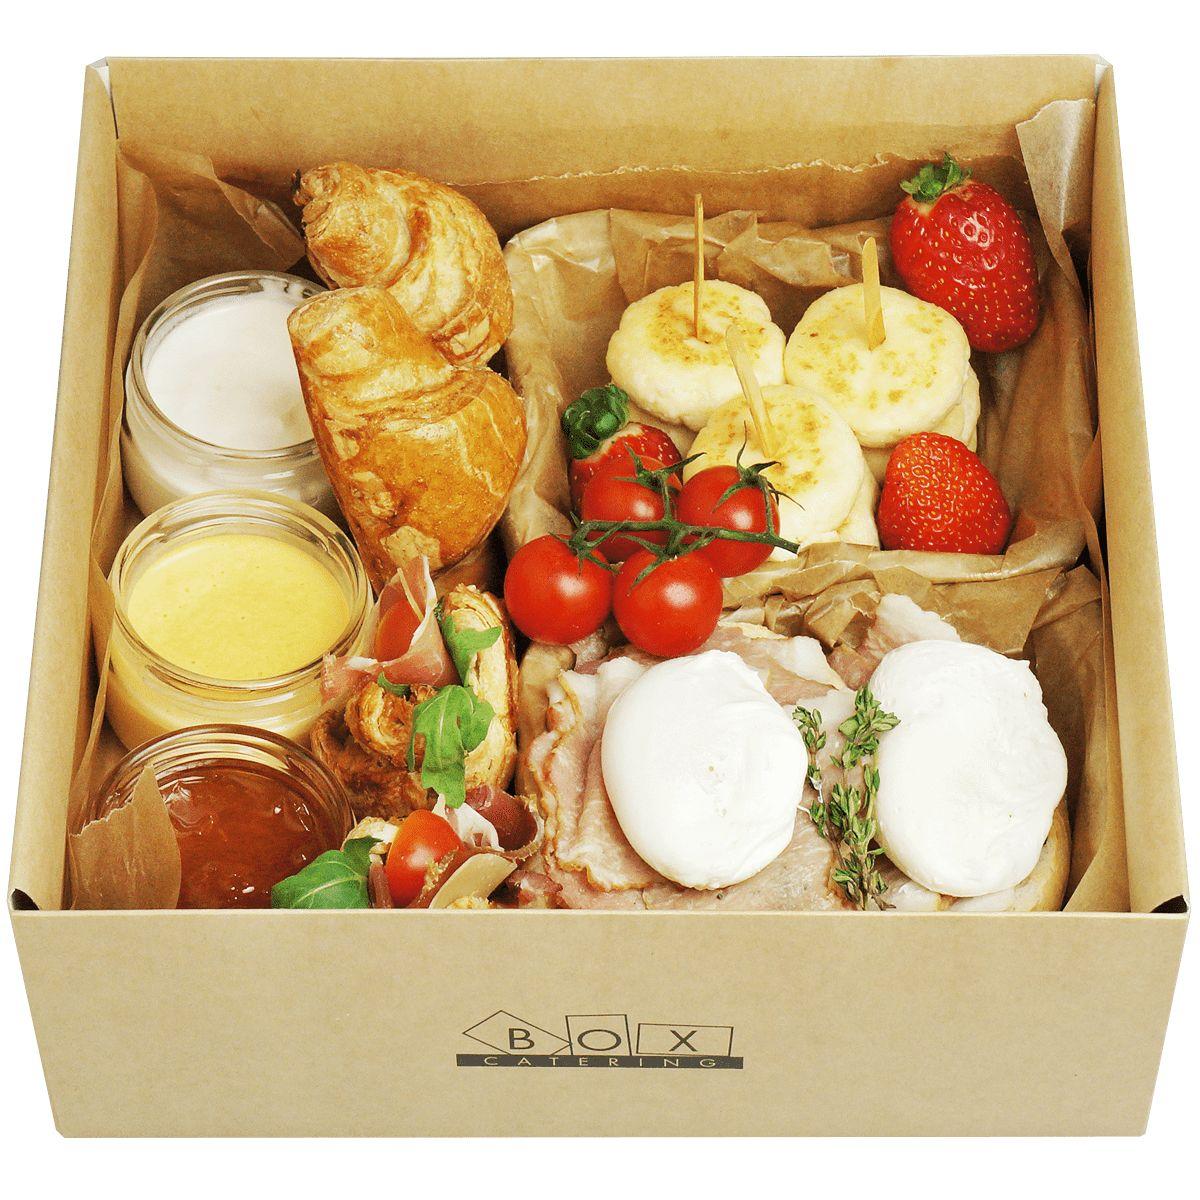 Breakfast бекон smart box фото 2